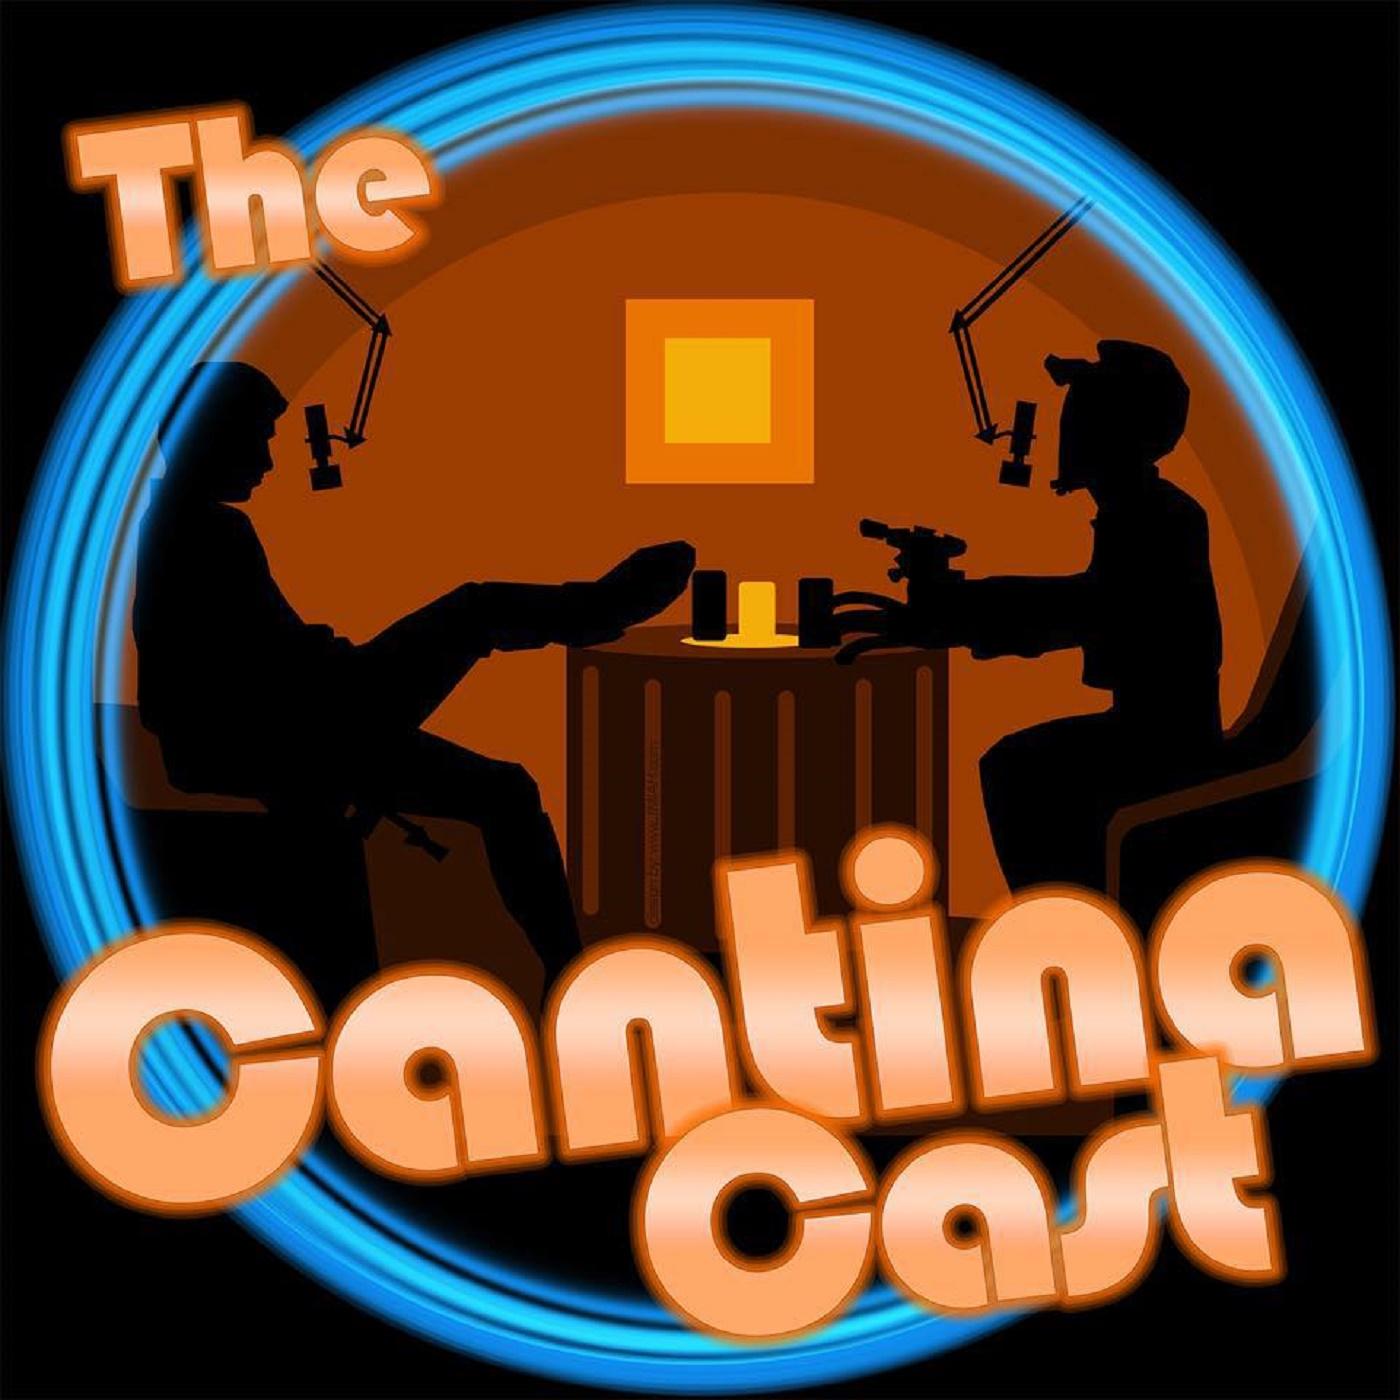 The Cantina Cast: Star Wars logo